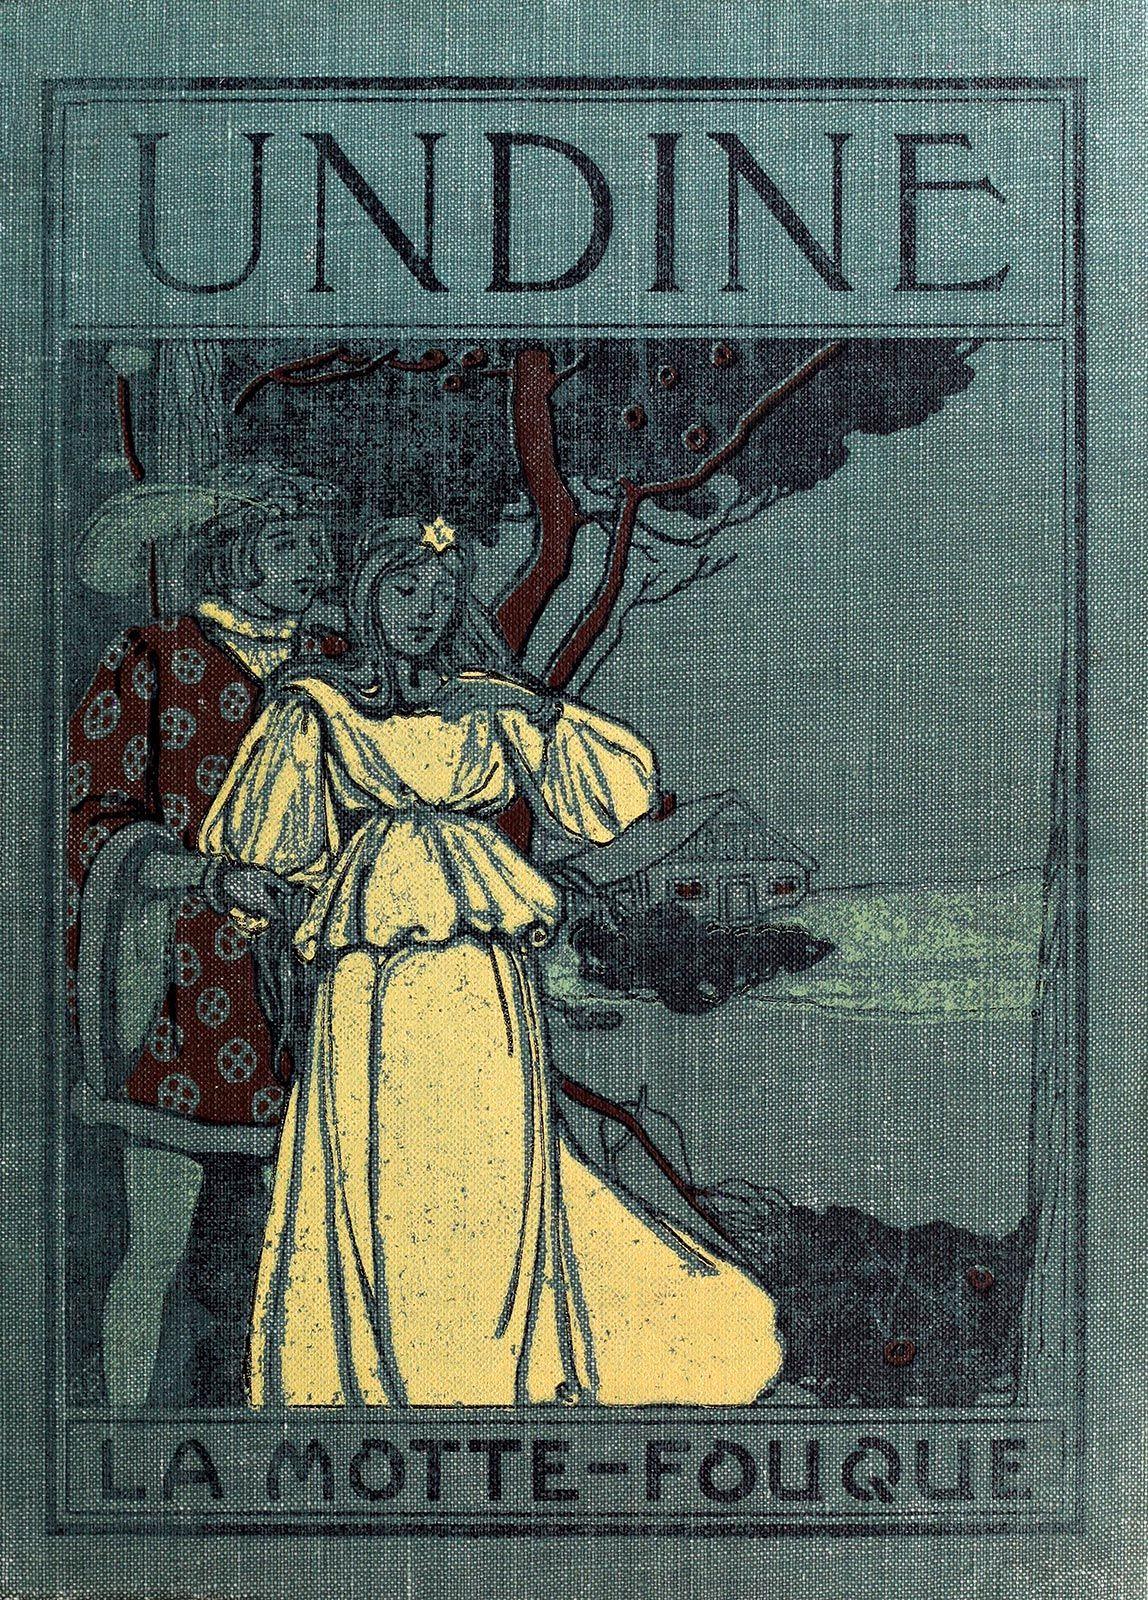 Undine A Legend Friedrich De La Motte Fouque Illustrated By Frances Bassett Comstock Mcloughlin Brot Book Cover Design Vintage Book Covers Best Book Covers